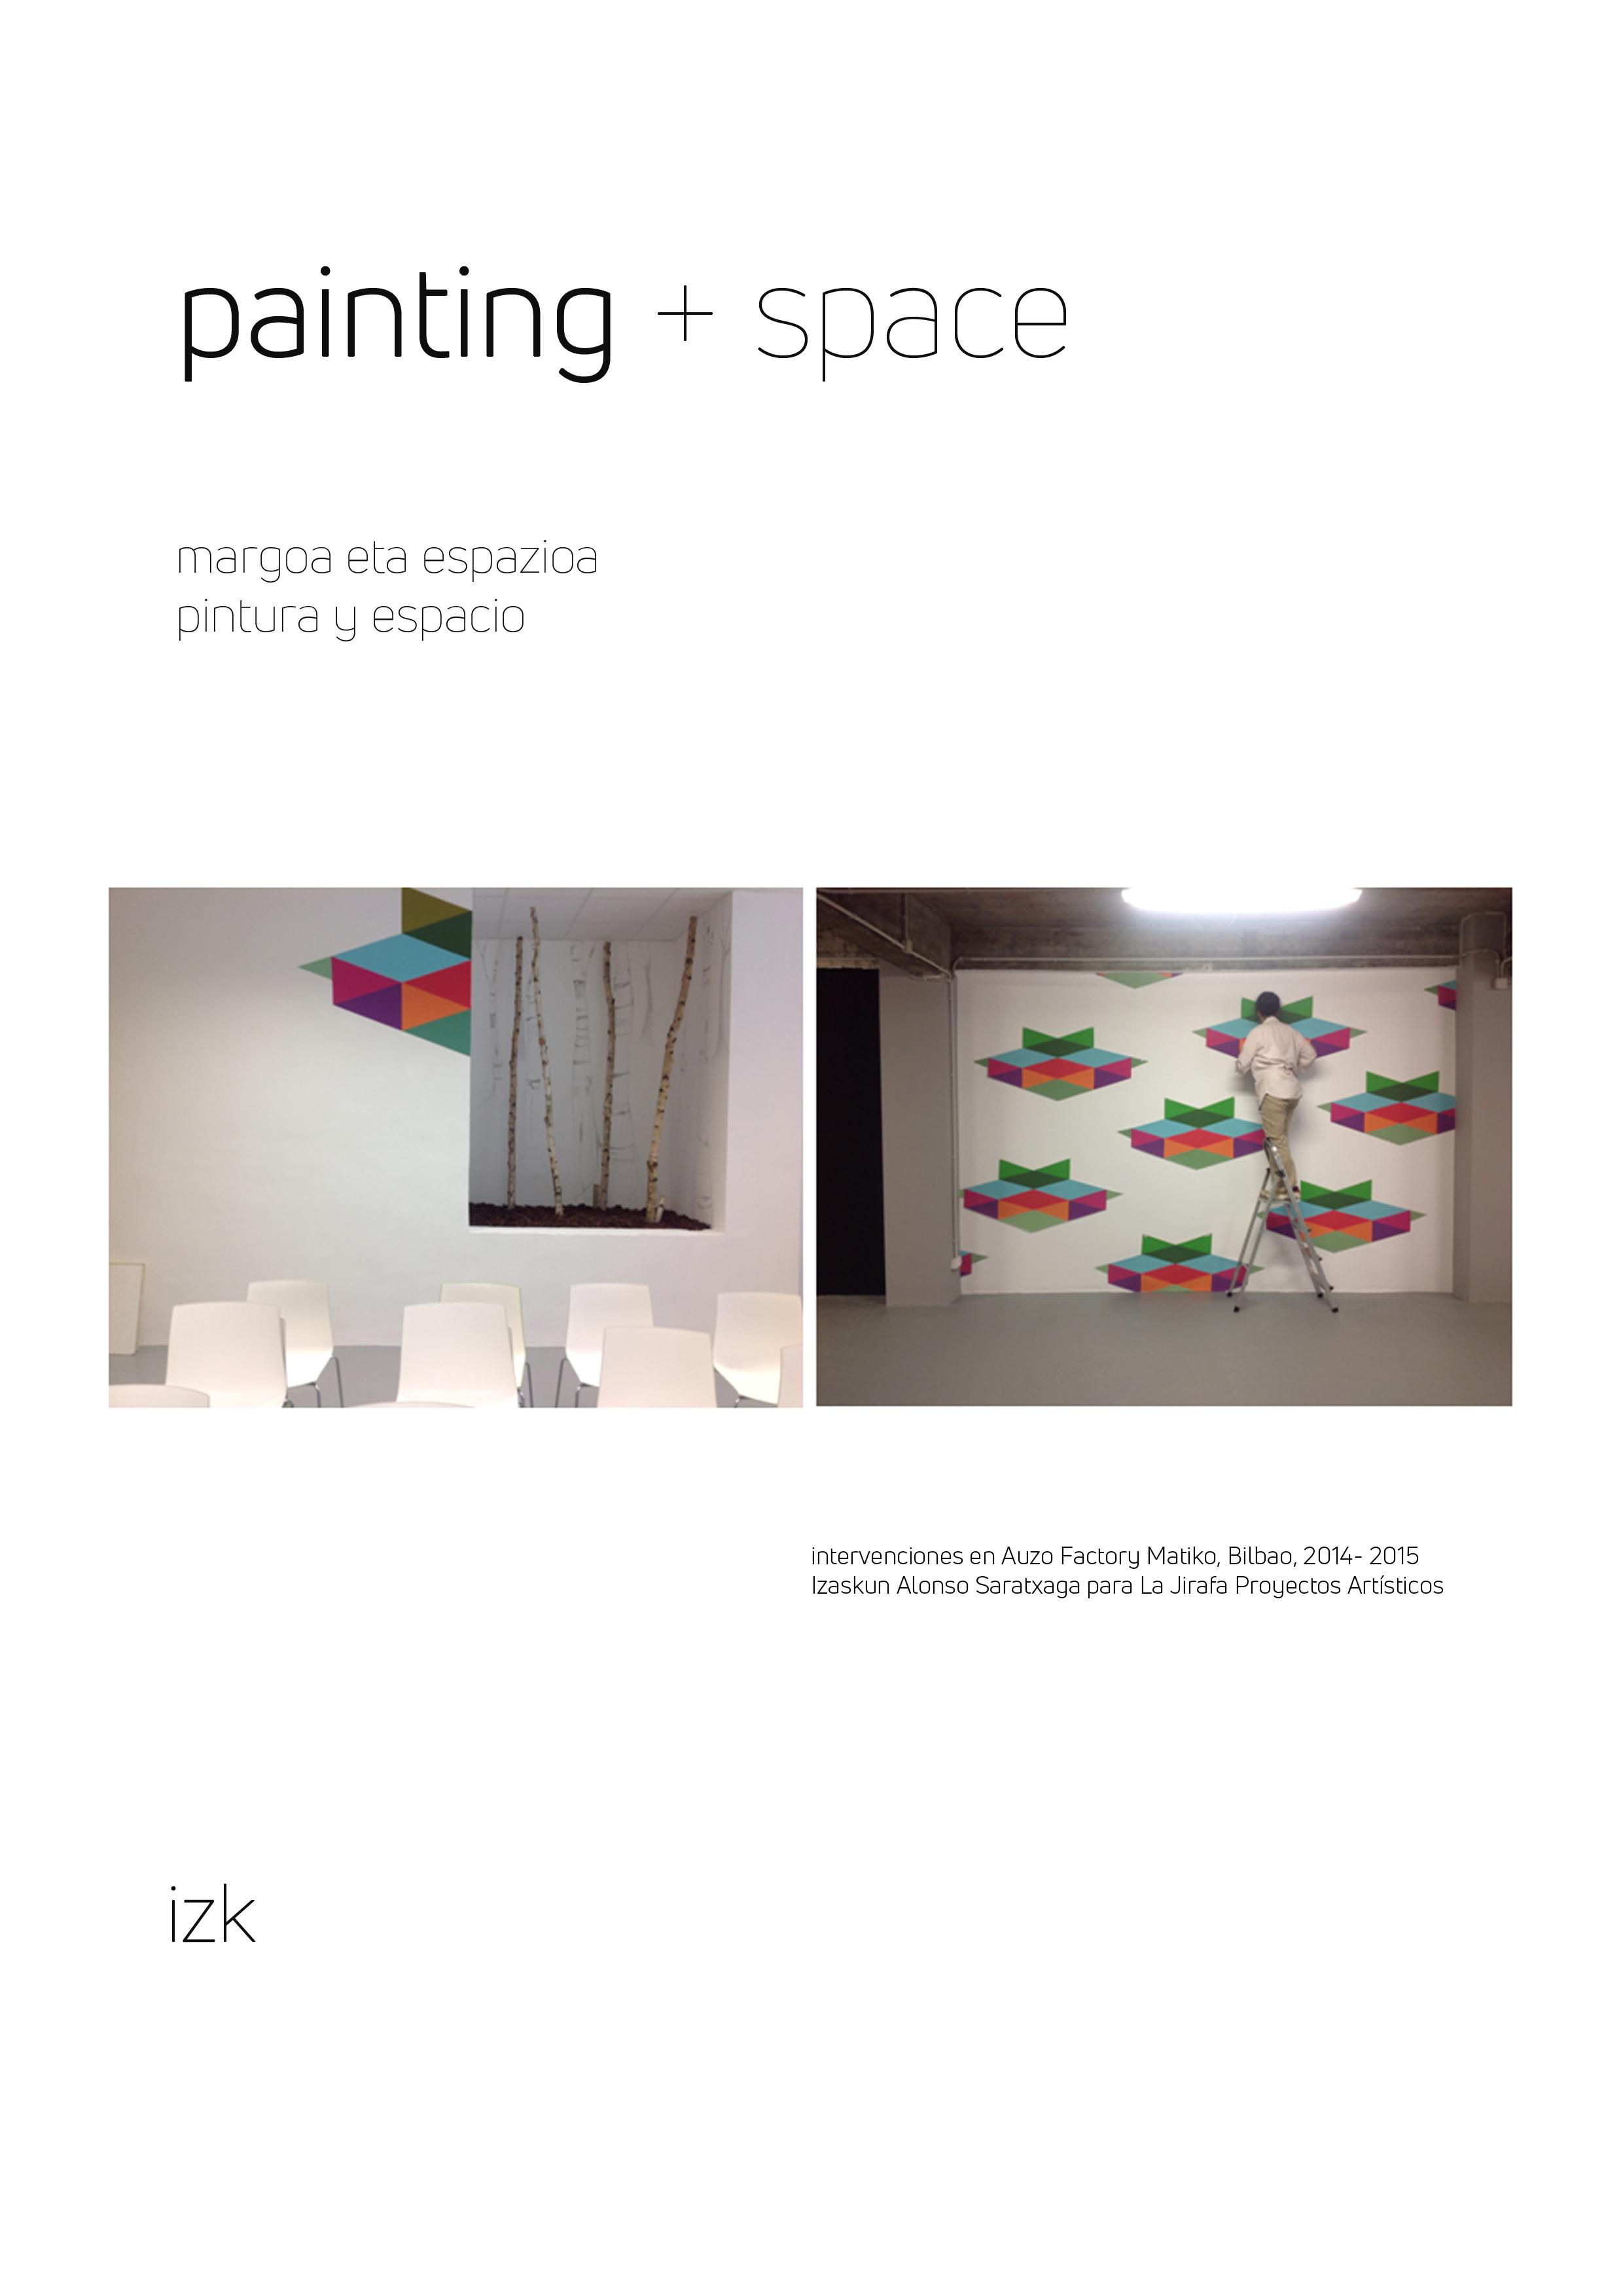 Pinturas que transforman lugares by Izaskun Alonso Saratxaga - Creative Work - $i